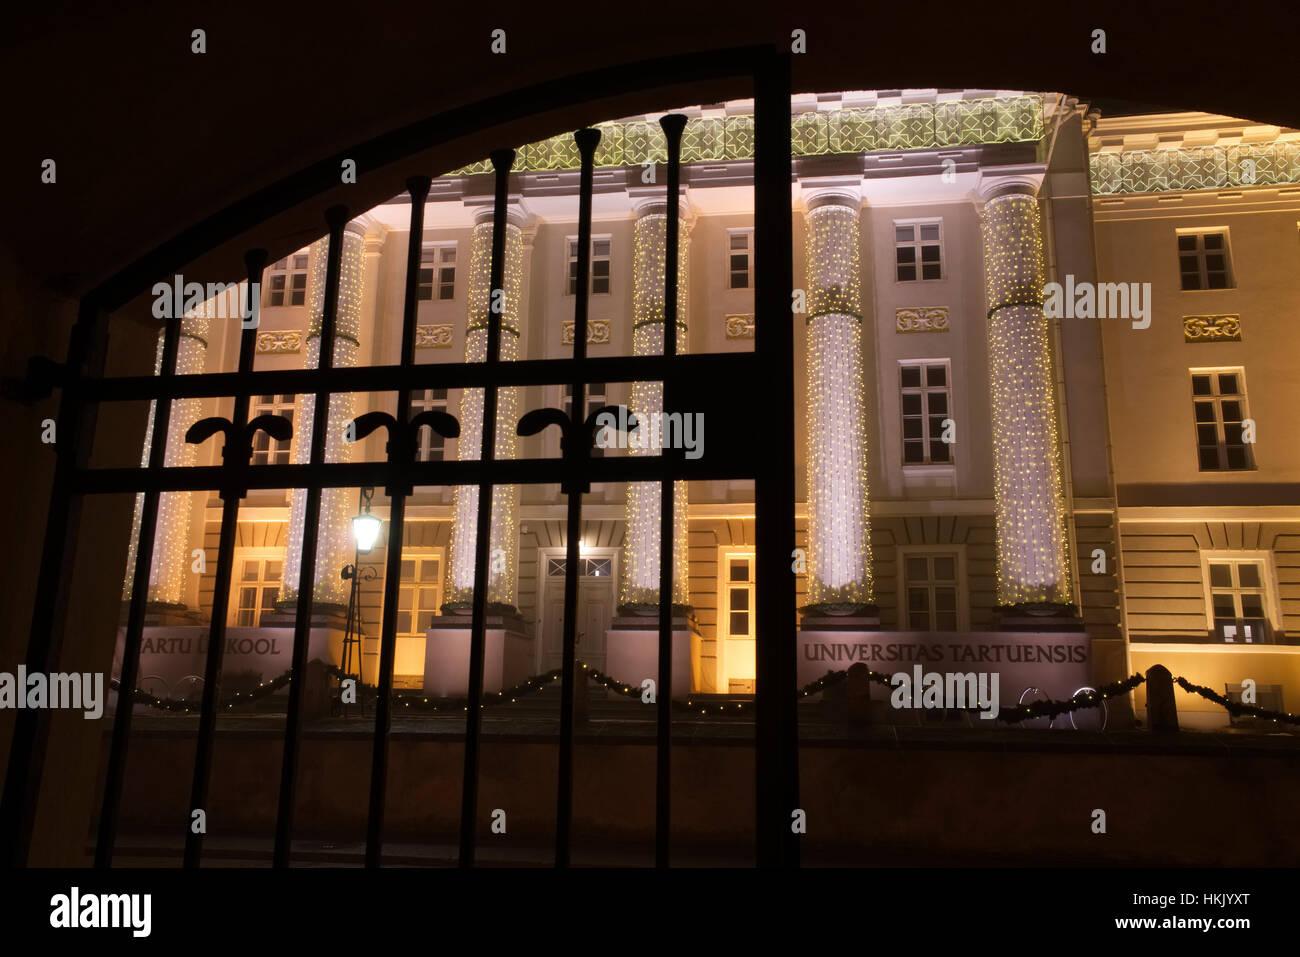 Tartu University's main building as seen through the gate. 28th January 2017 - Stock Image